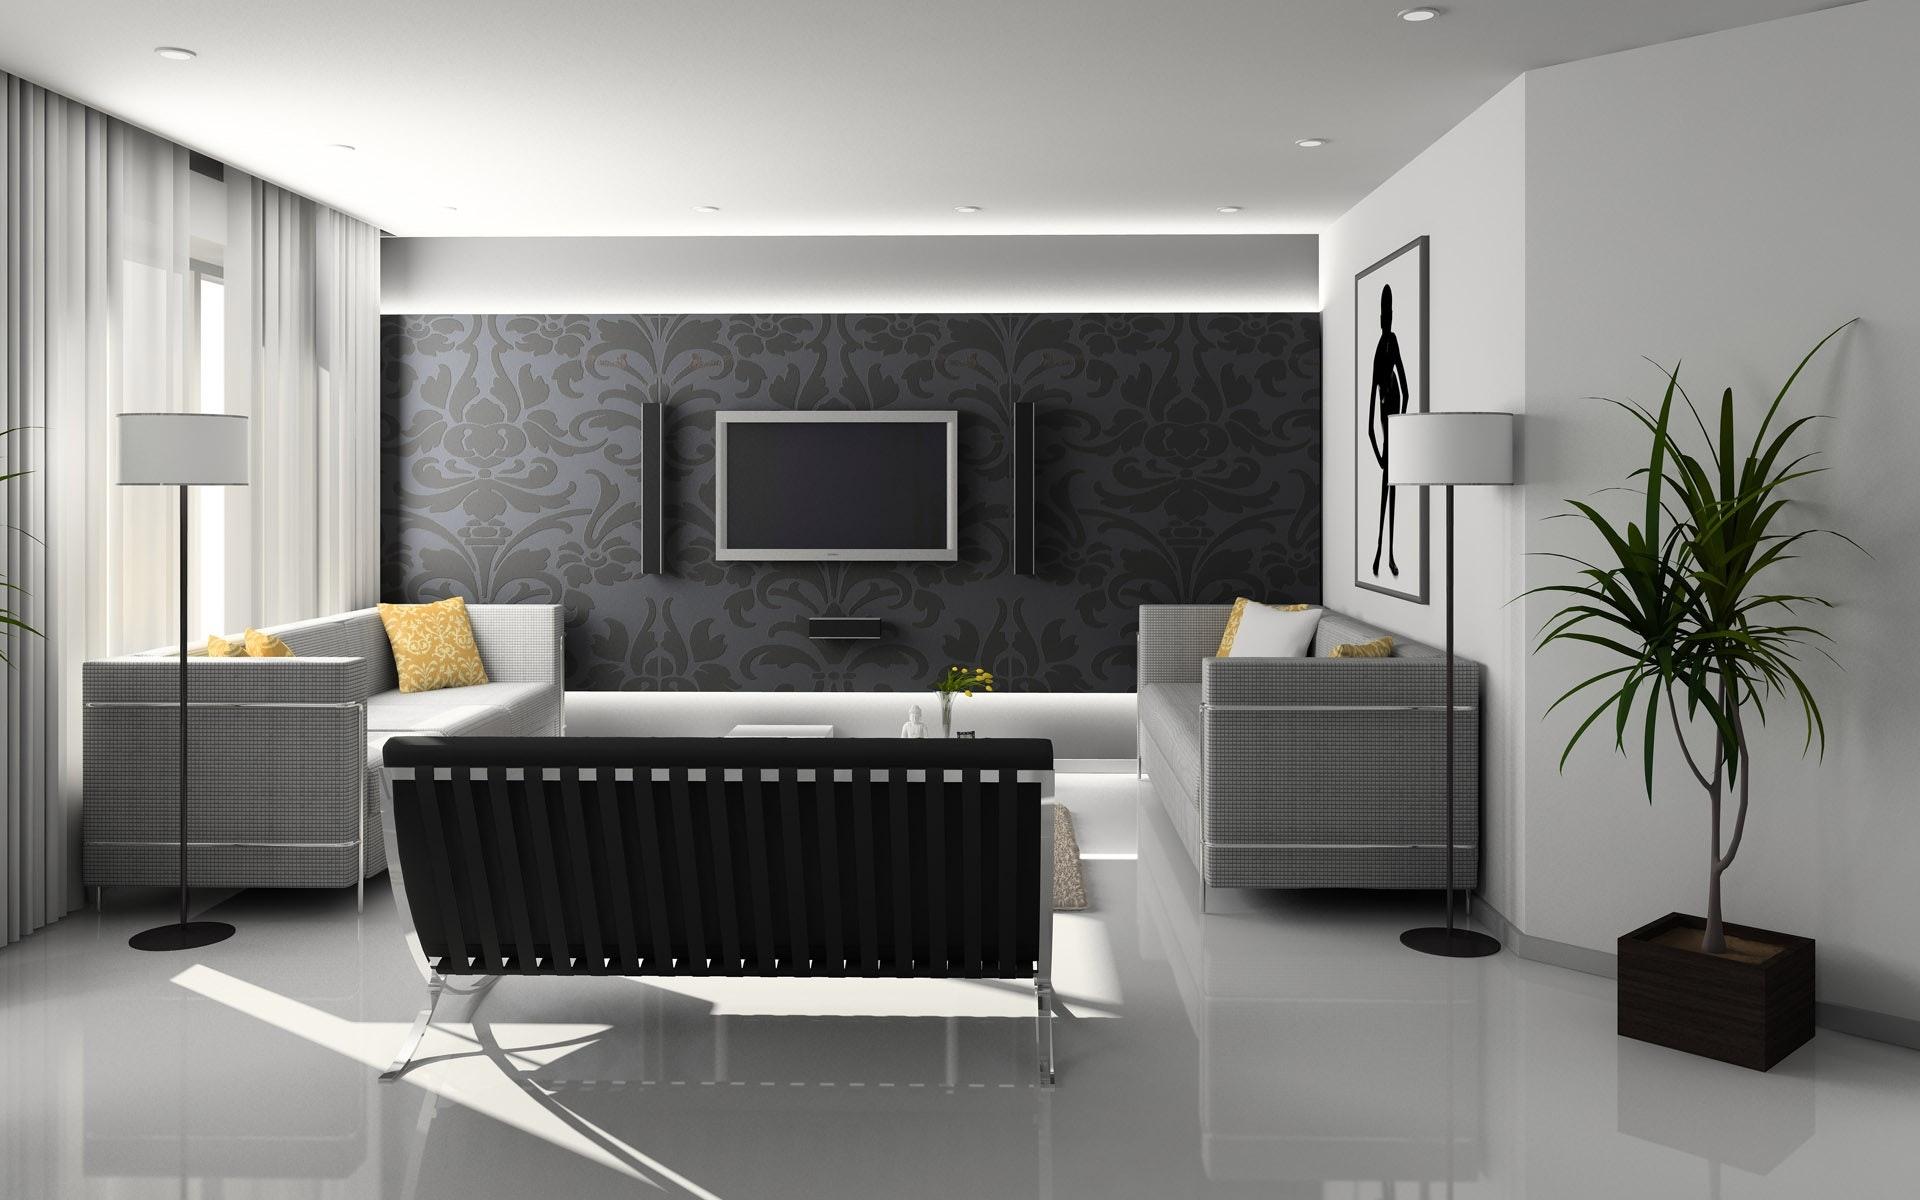 5 Reasons to Go with Epoxy Flooring